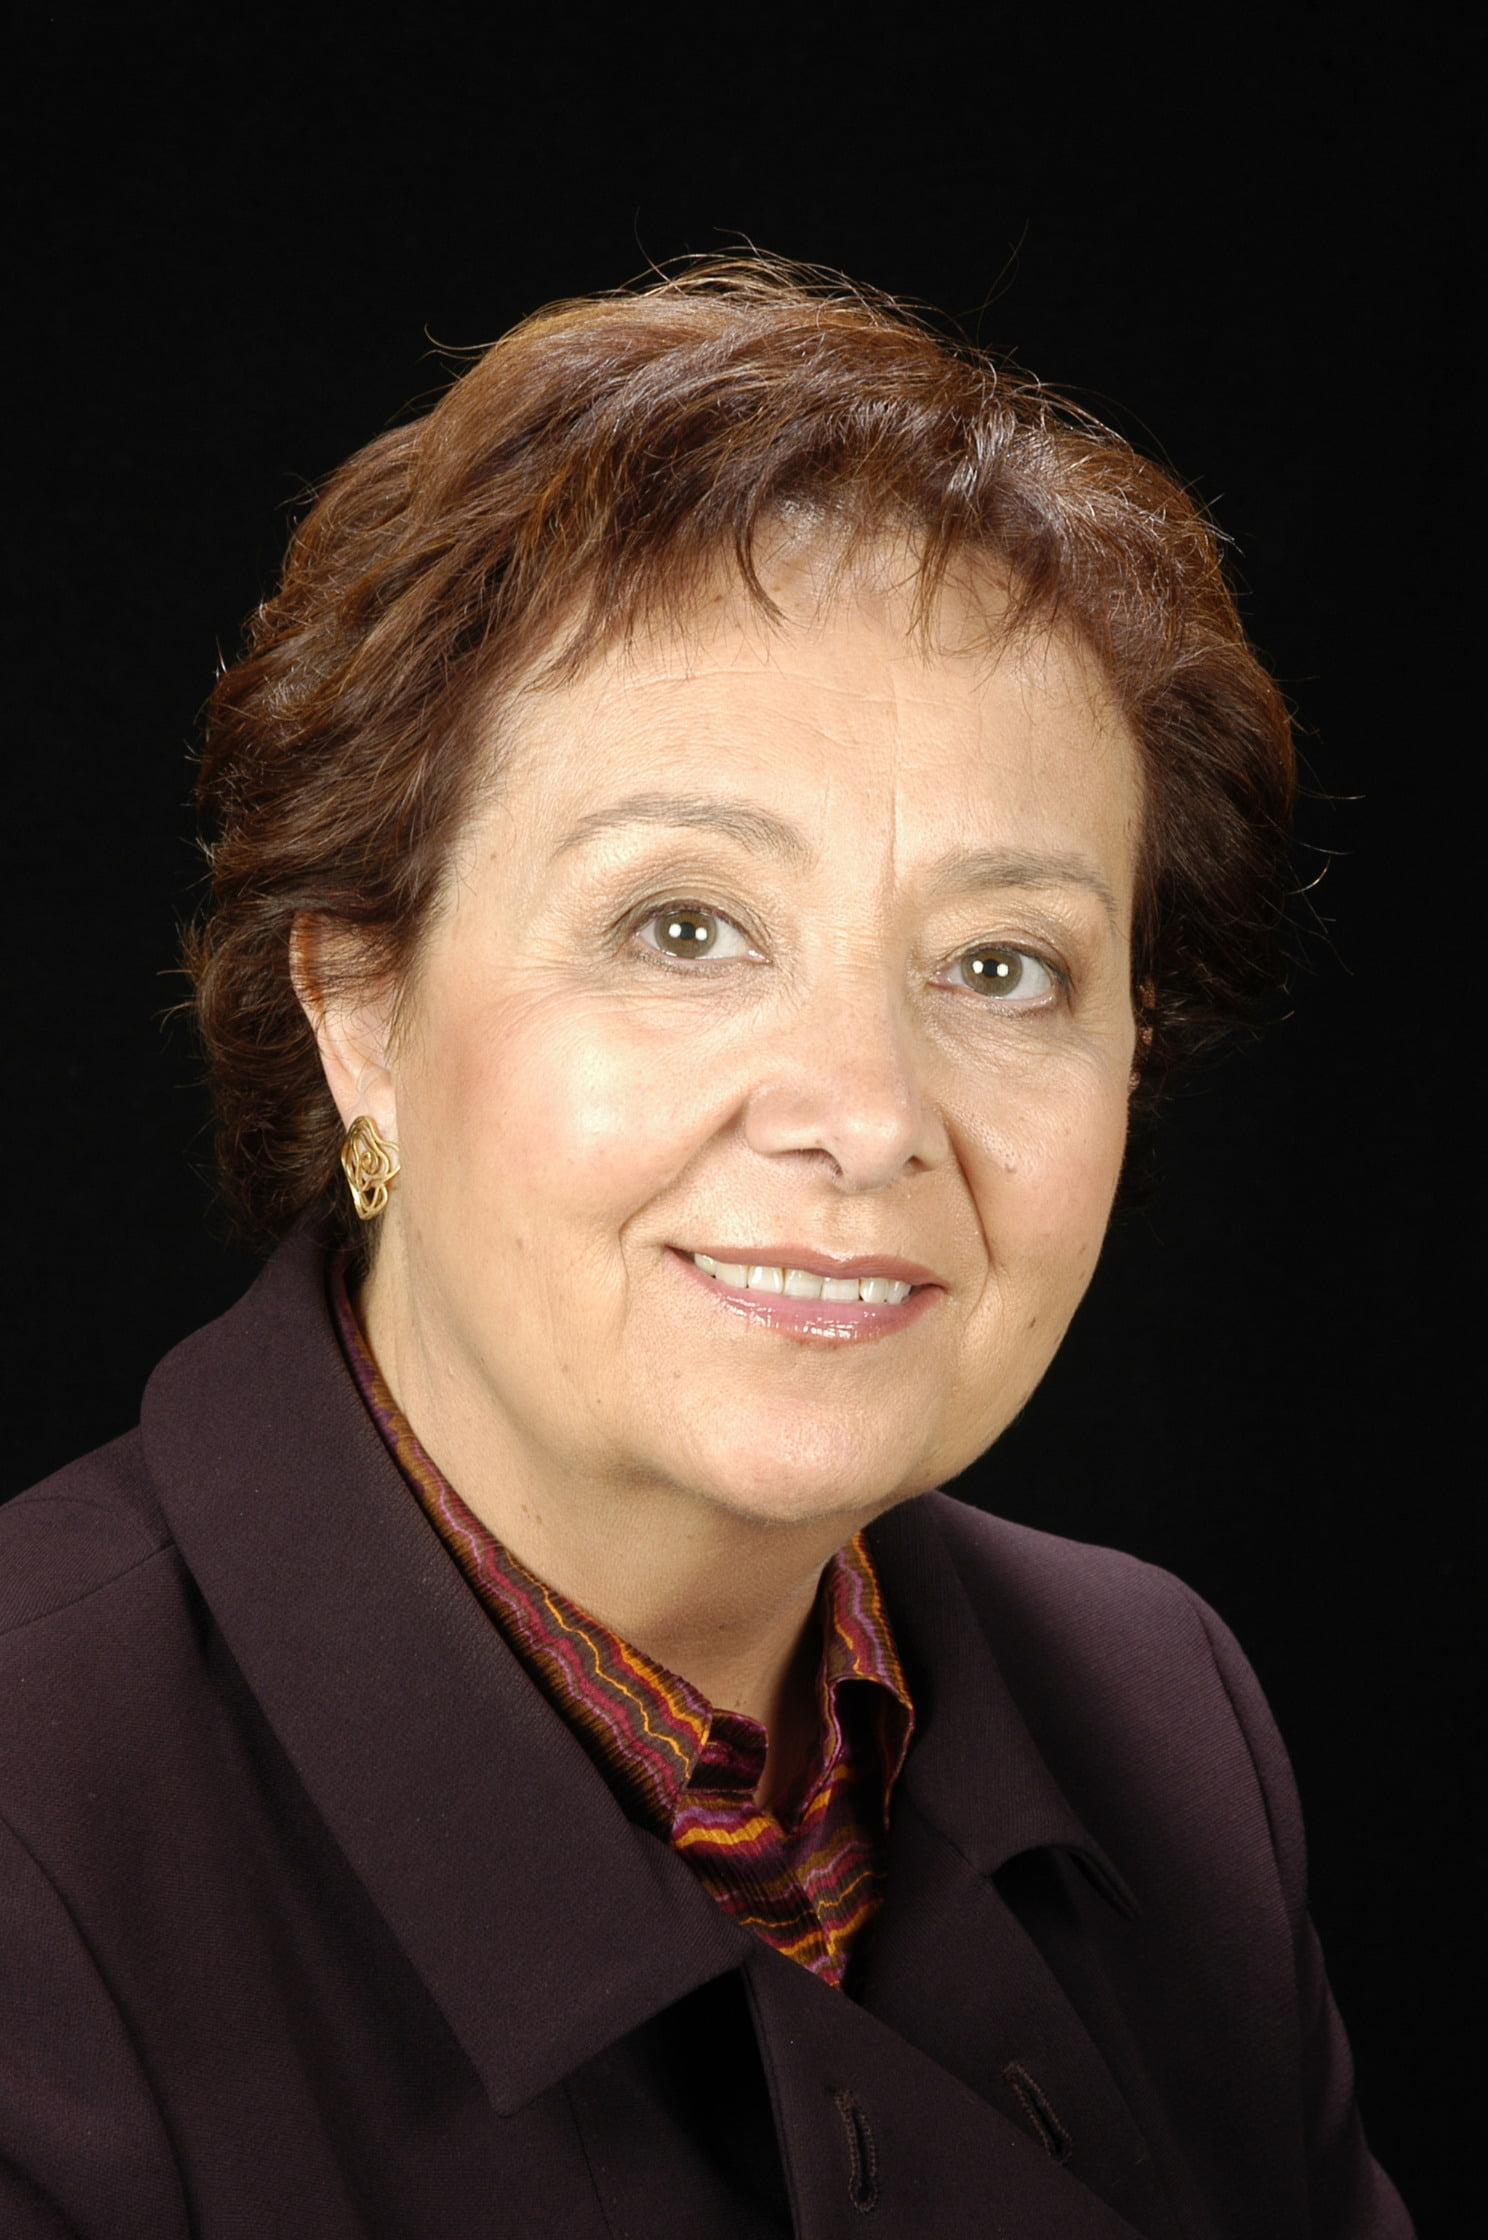 Dra. M. Teresa Butiñà Agustí